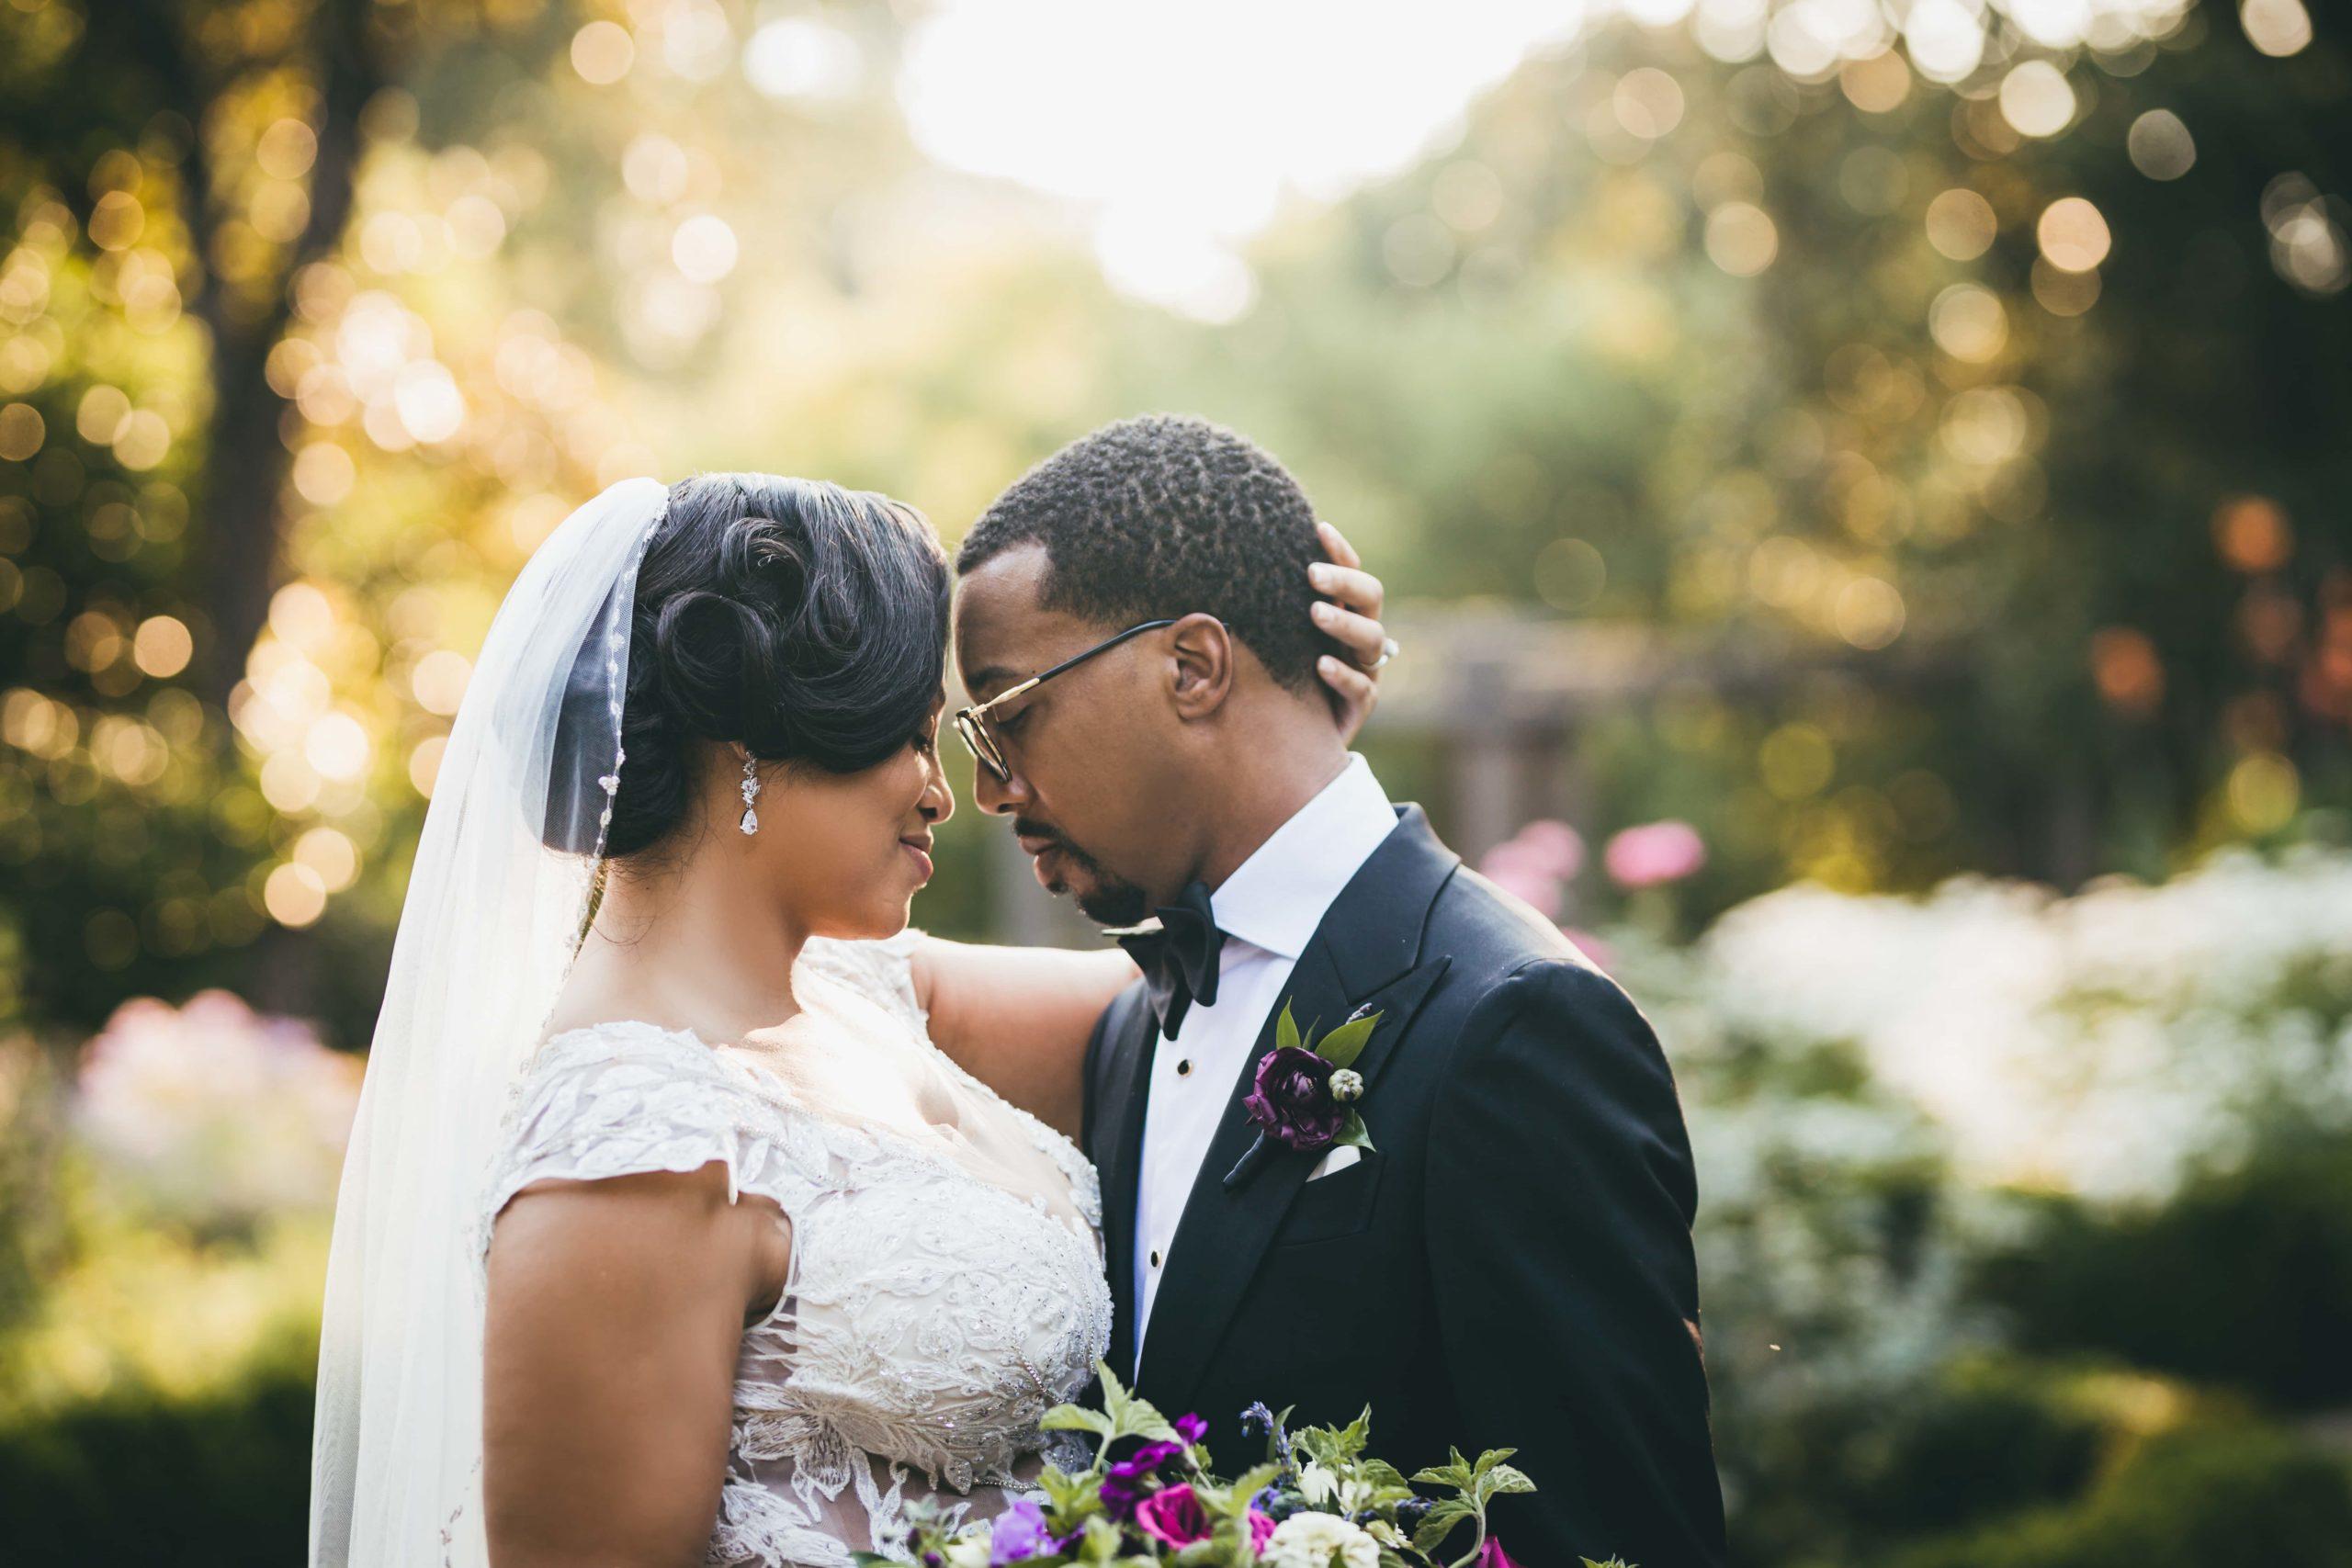 Callanwolde-Wedding-Alicia-Brandon-Love-and-Story-1079